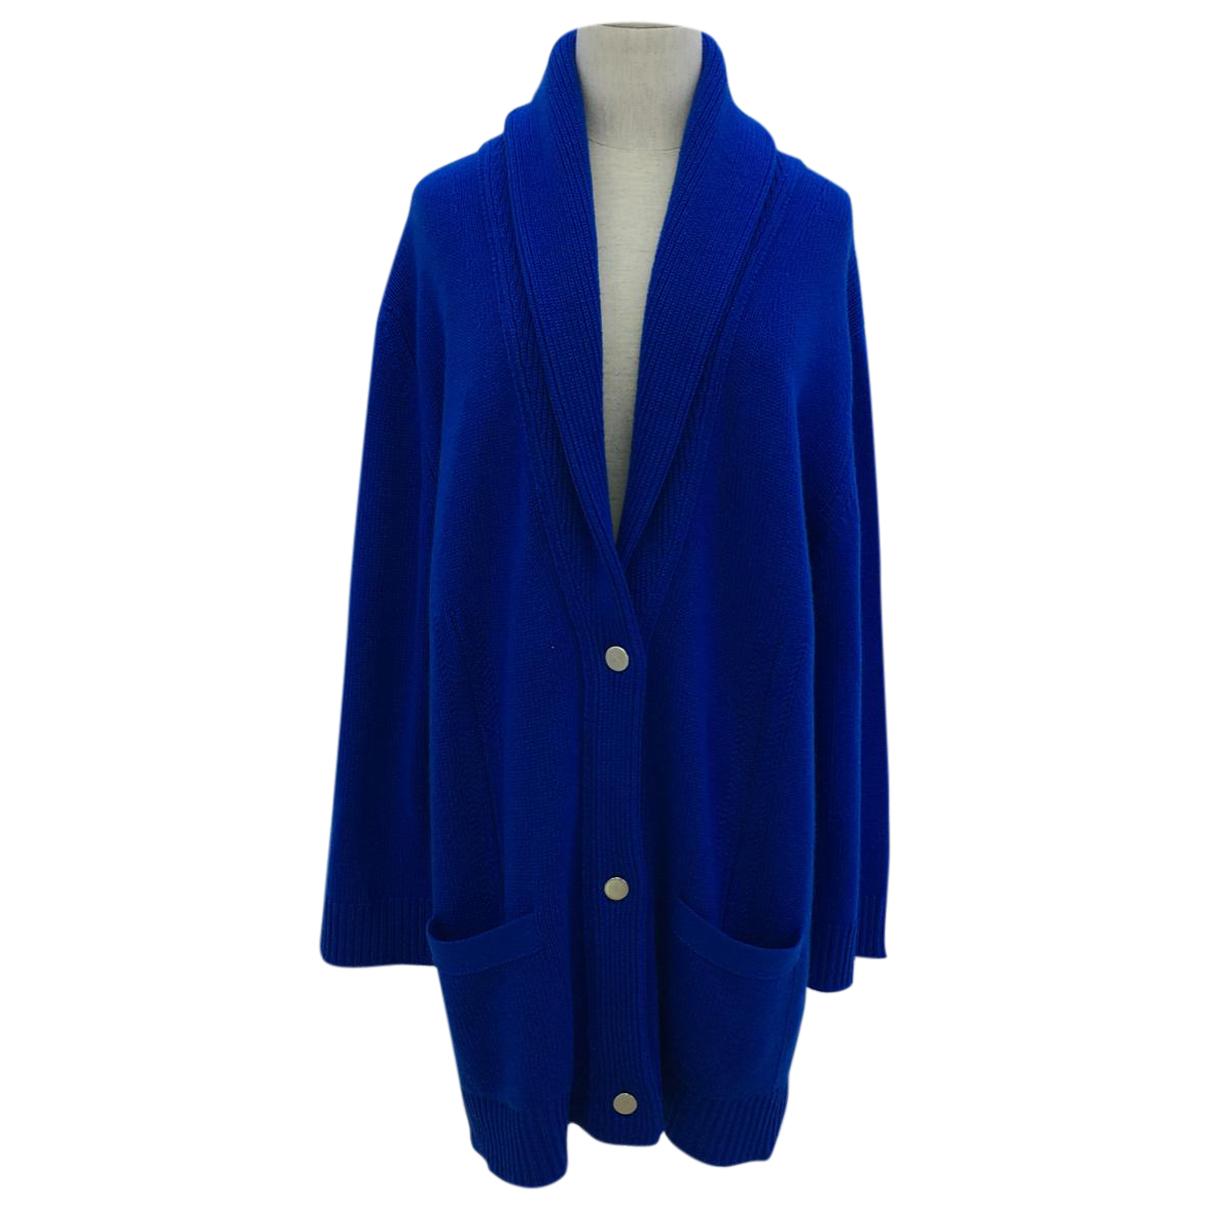 Hermès N Blue Cashmere Knitwear for Women 38 FR